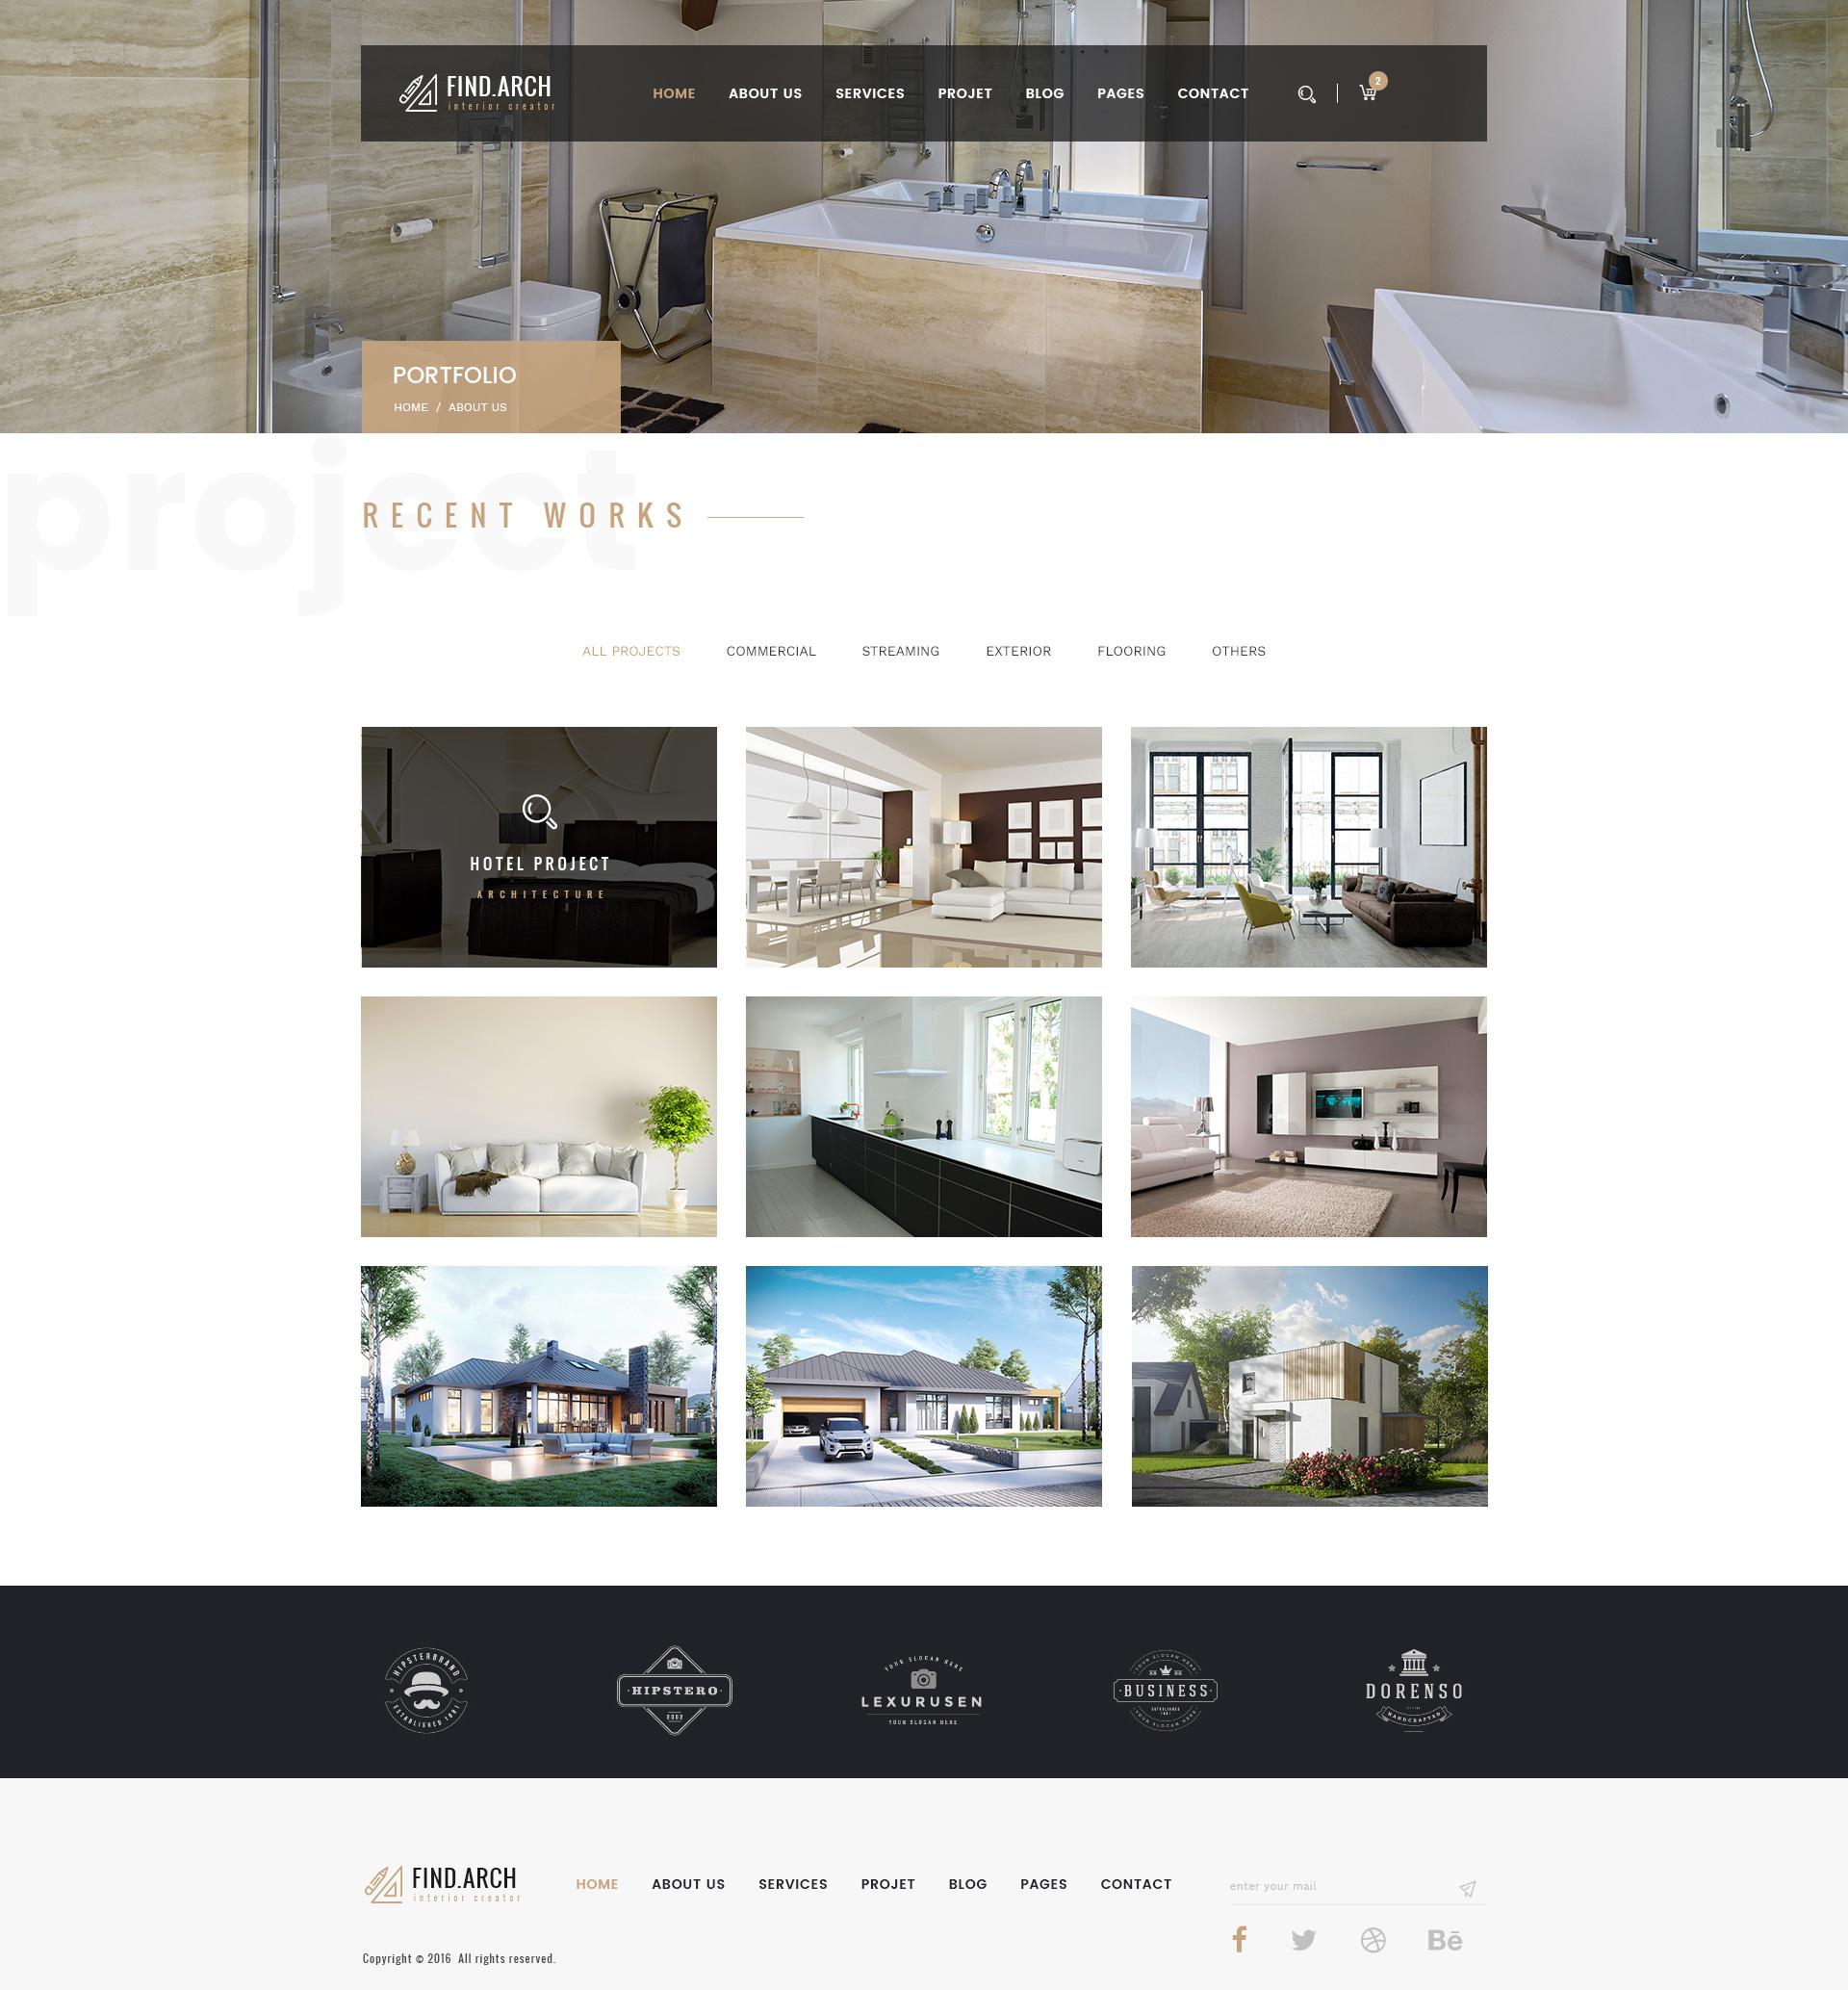 Find arc interior design architecture psd template by for Find interior decorator